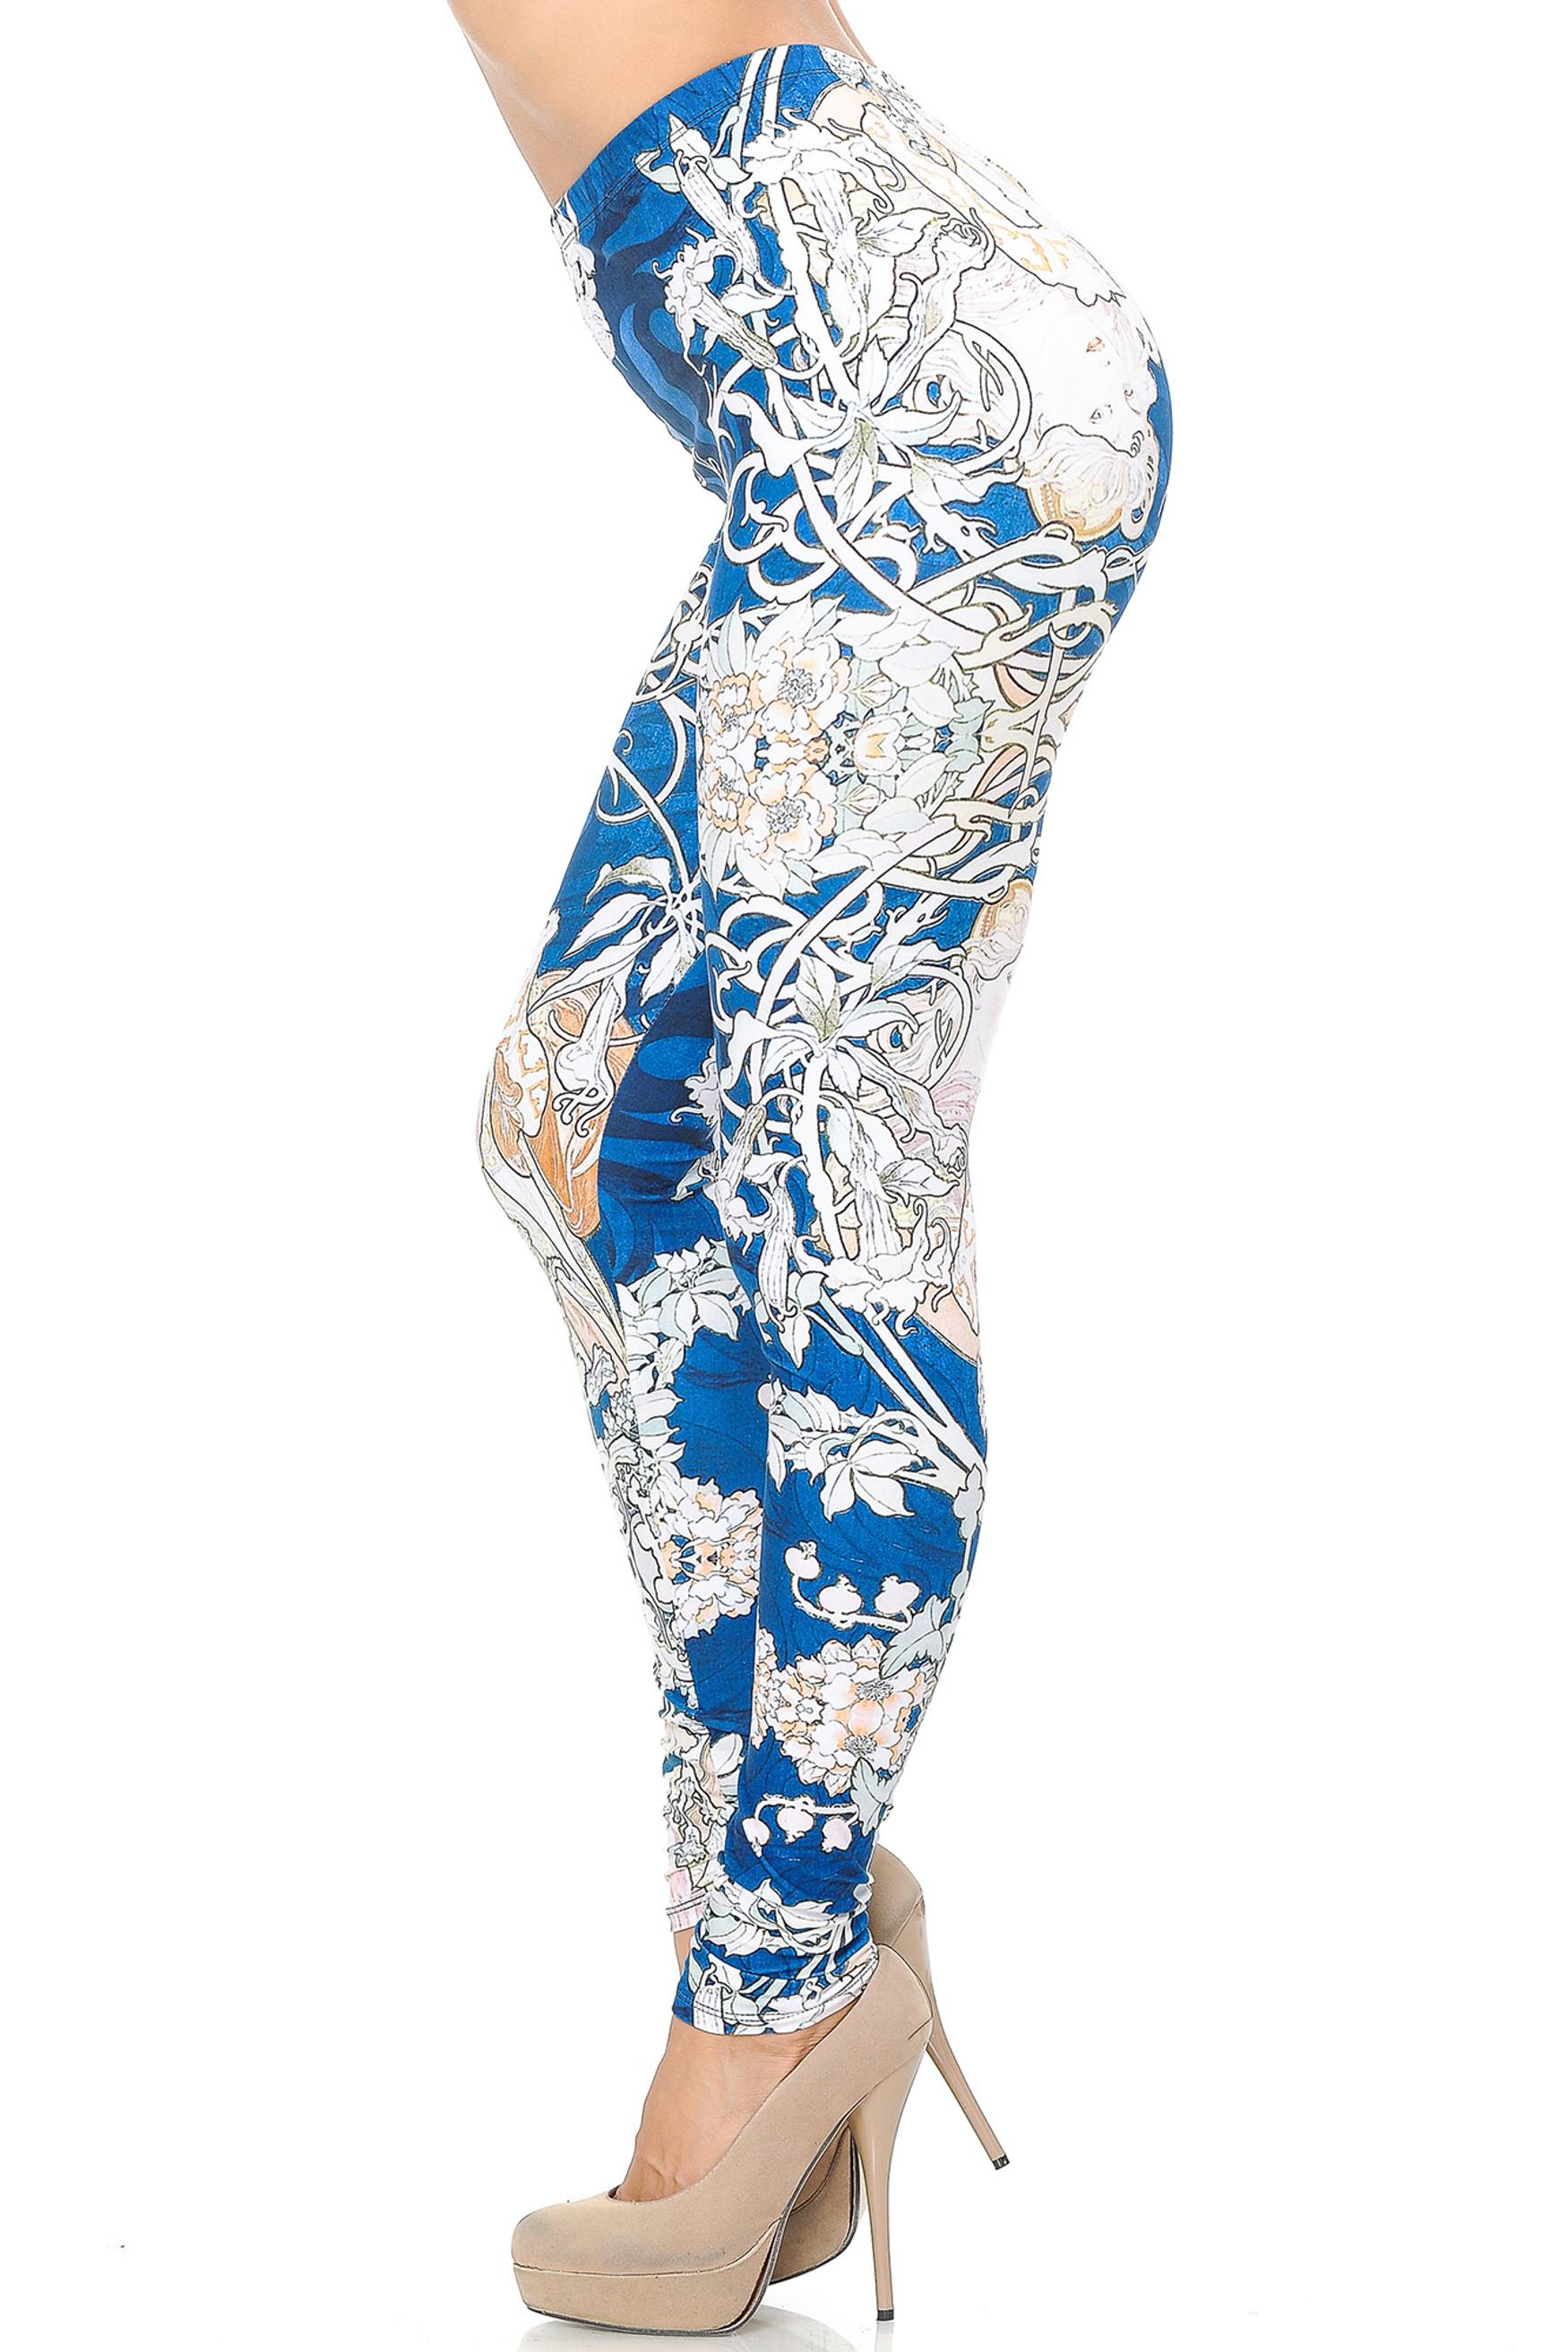 Creamy Soft Twisted Eden Vine Leggings - USA Fashion™